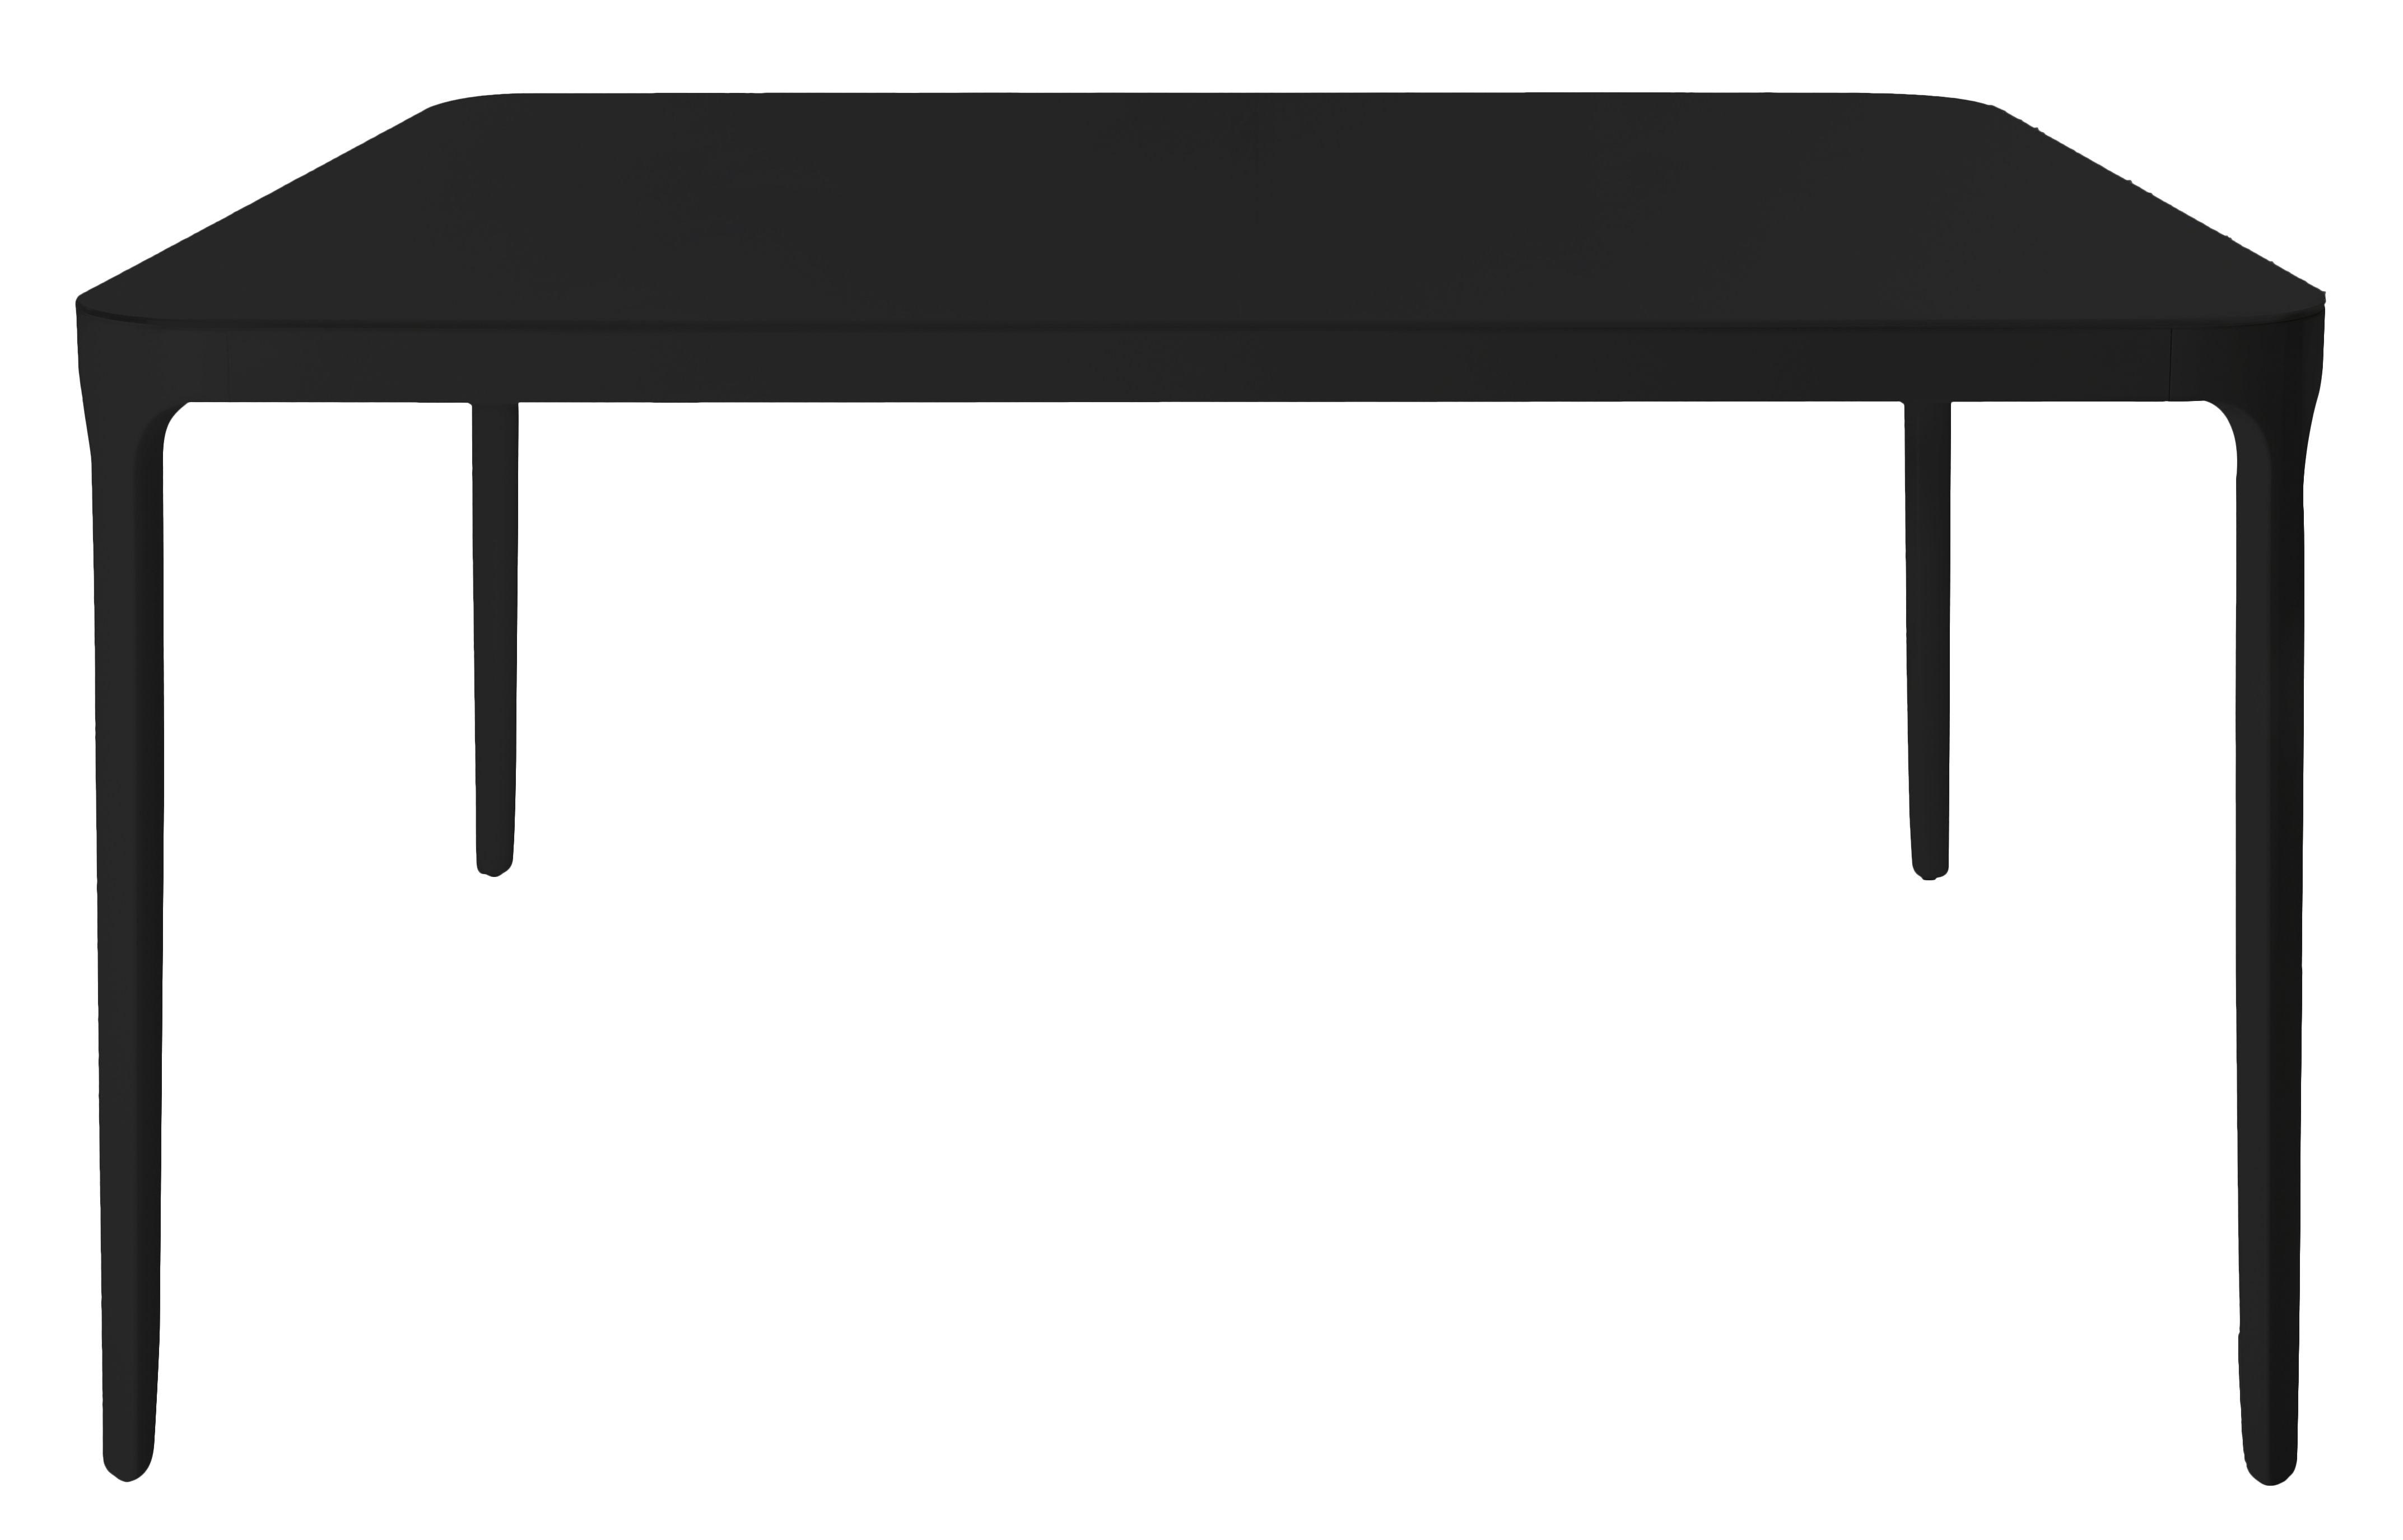 Mobilier - Tables - Table Vanity / 90 x 90 cm - Magis - Noir - 90 x 90 cm - Aluminium verni, Verre verni